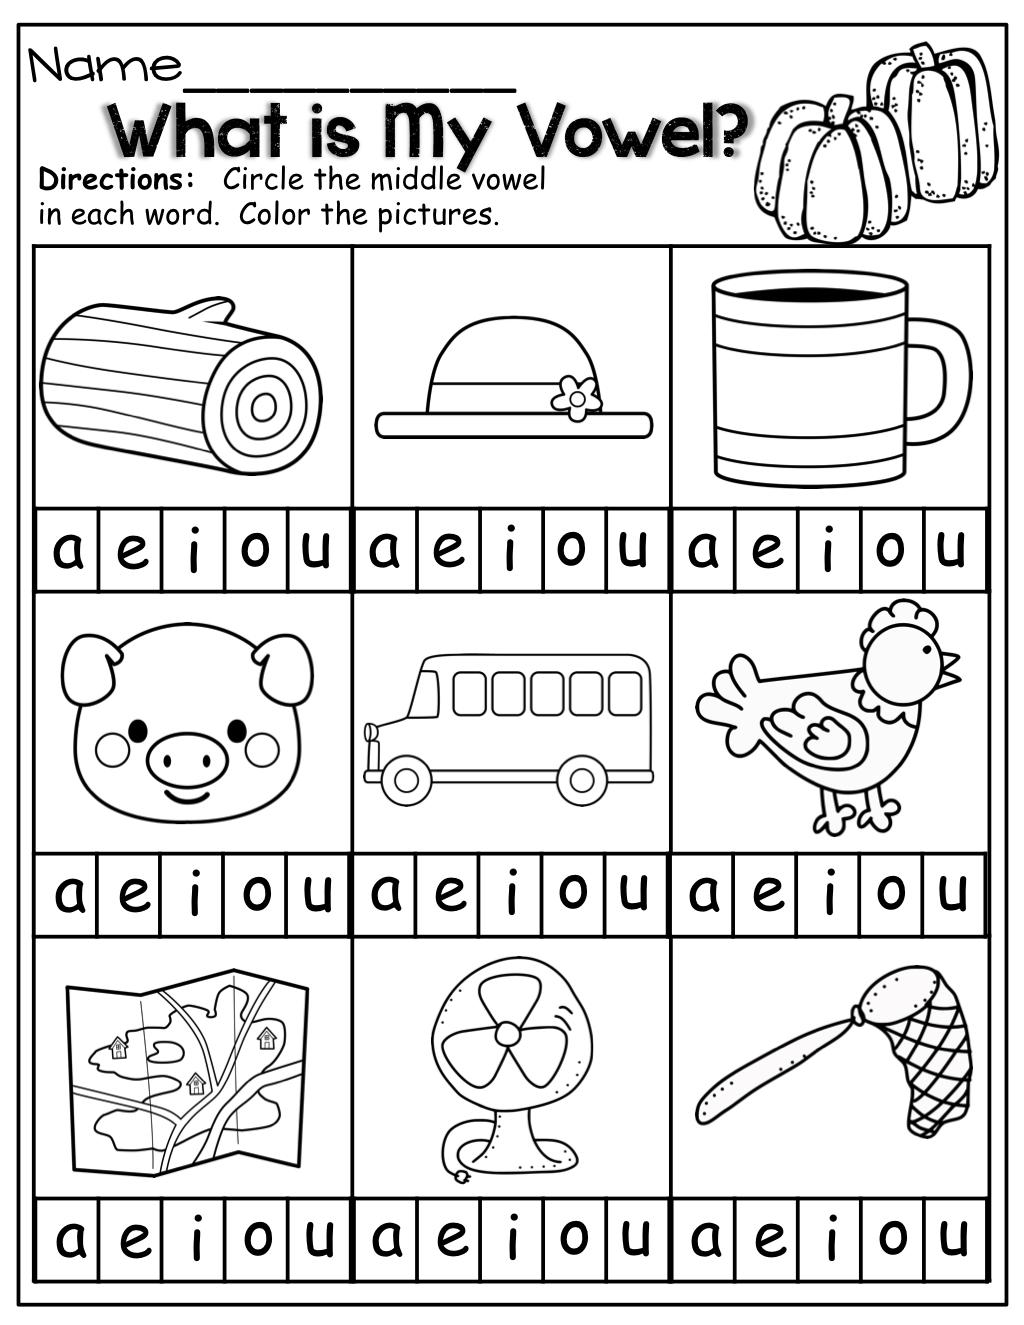 Fall Math And Literacy Packet Kindergarten Ingles Para Preescolar Educacion De La Primera Infancia Primeros Grados [ 1325 x 1024 Pixel ]